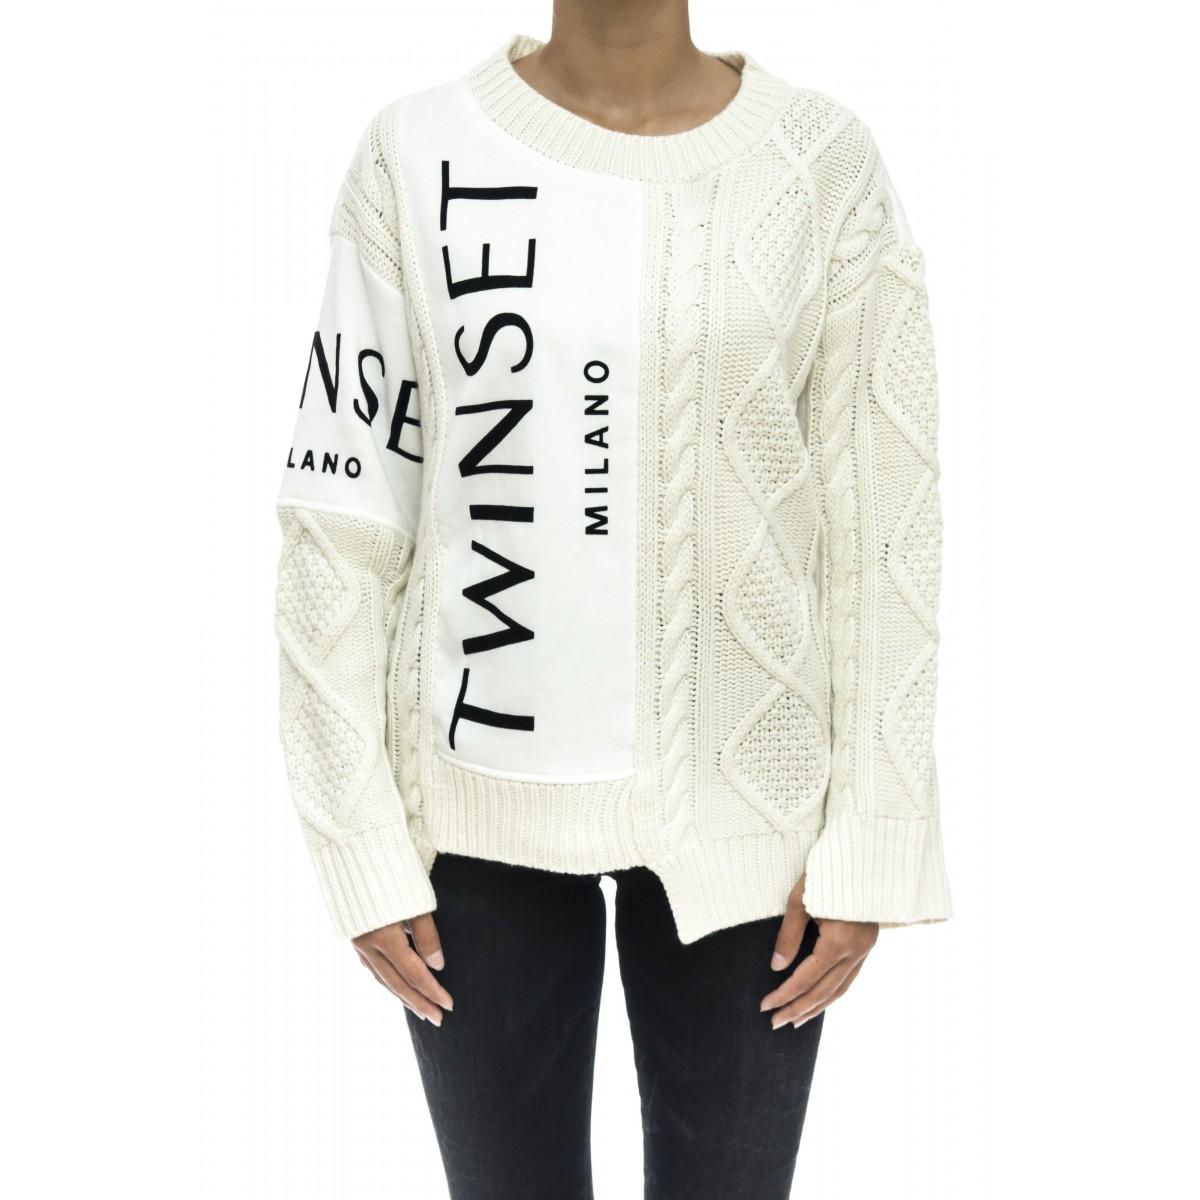 Felpa donna - Tt3060 felpa piu lana treccia logo